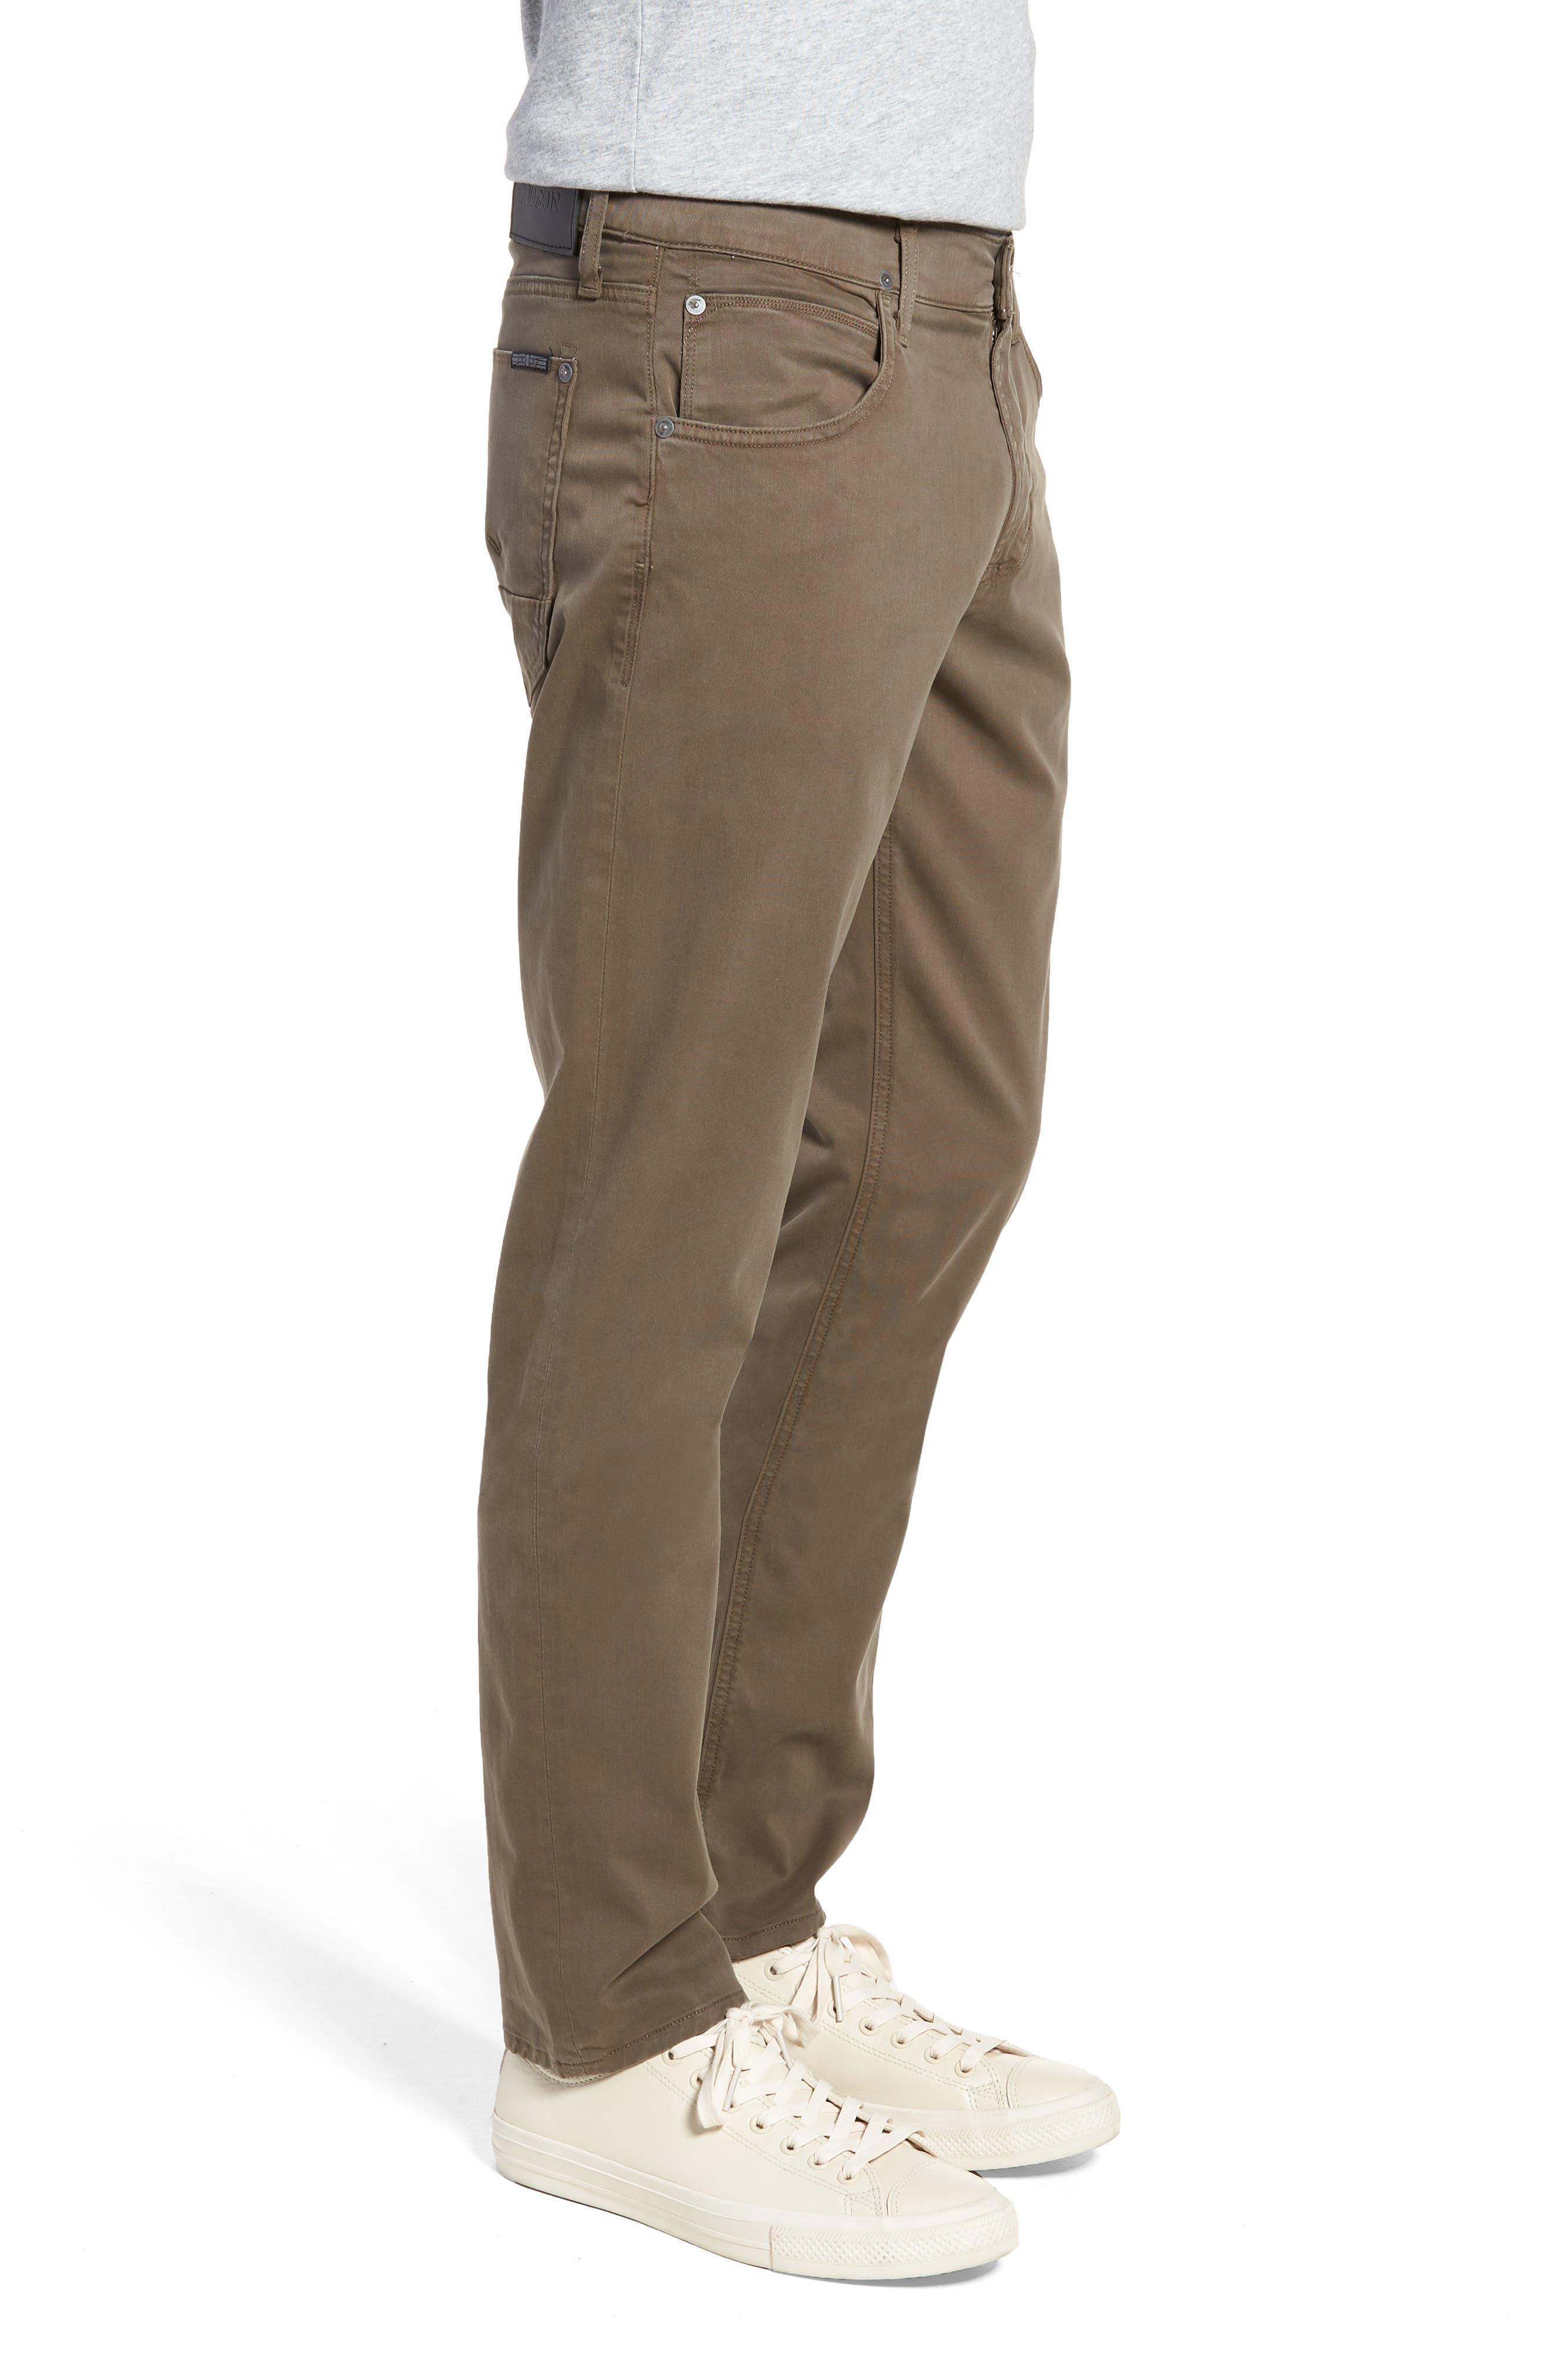 Blake Slim Fit Jeans,                             Alternate thumbnail 3, color,                             PLASTER